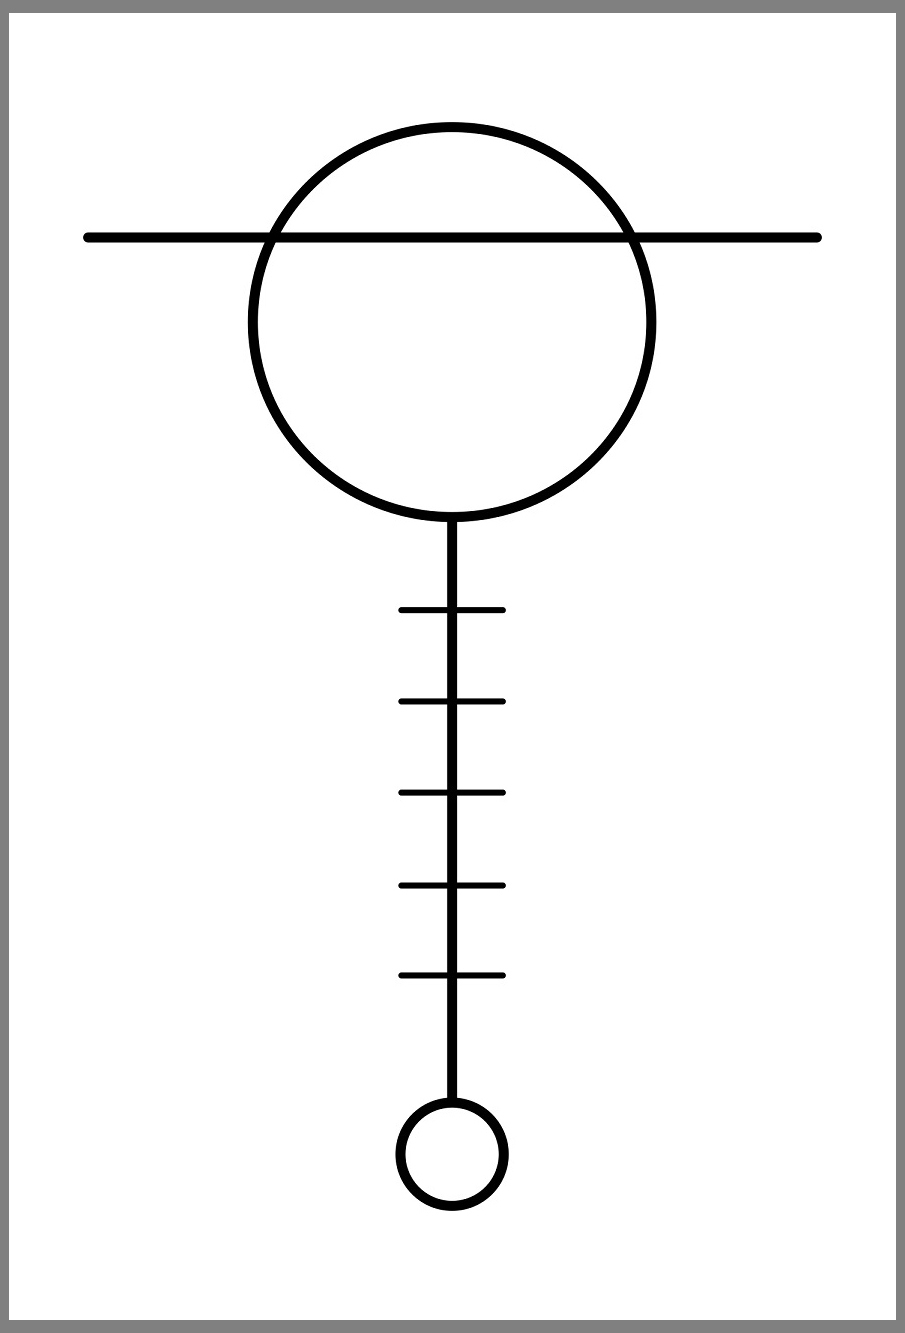 Diagram # 001A illustration